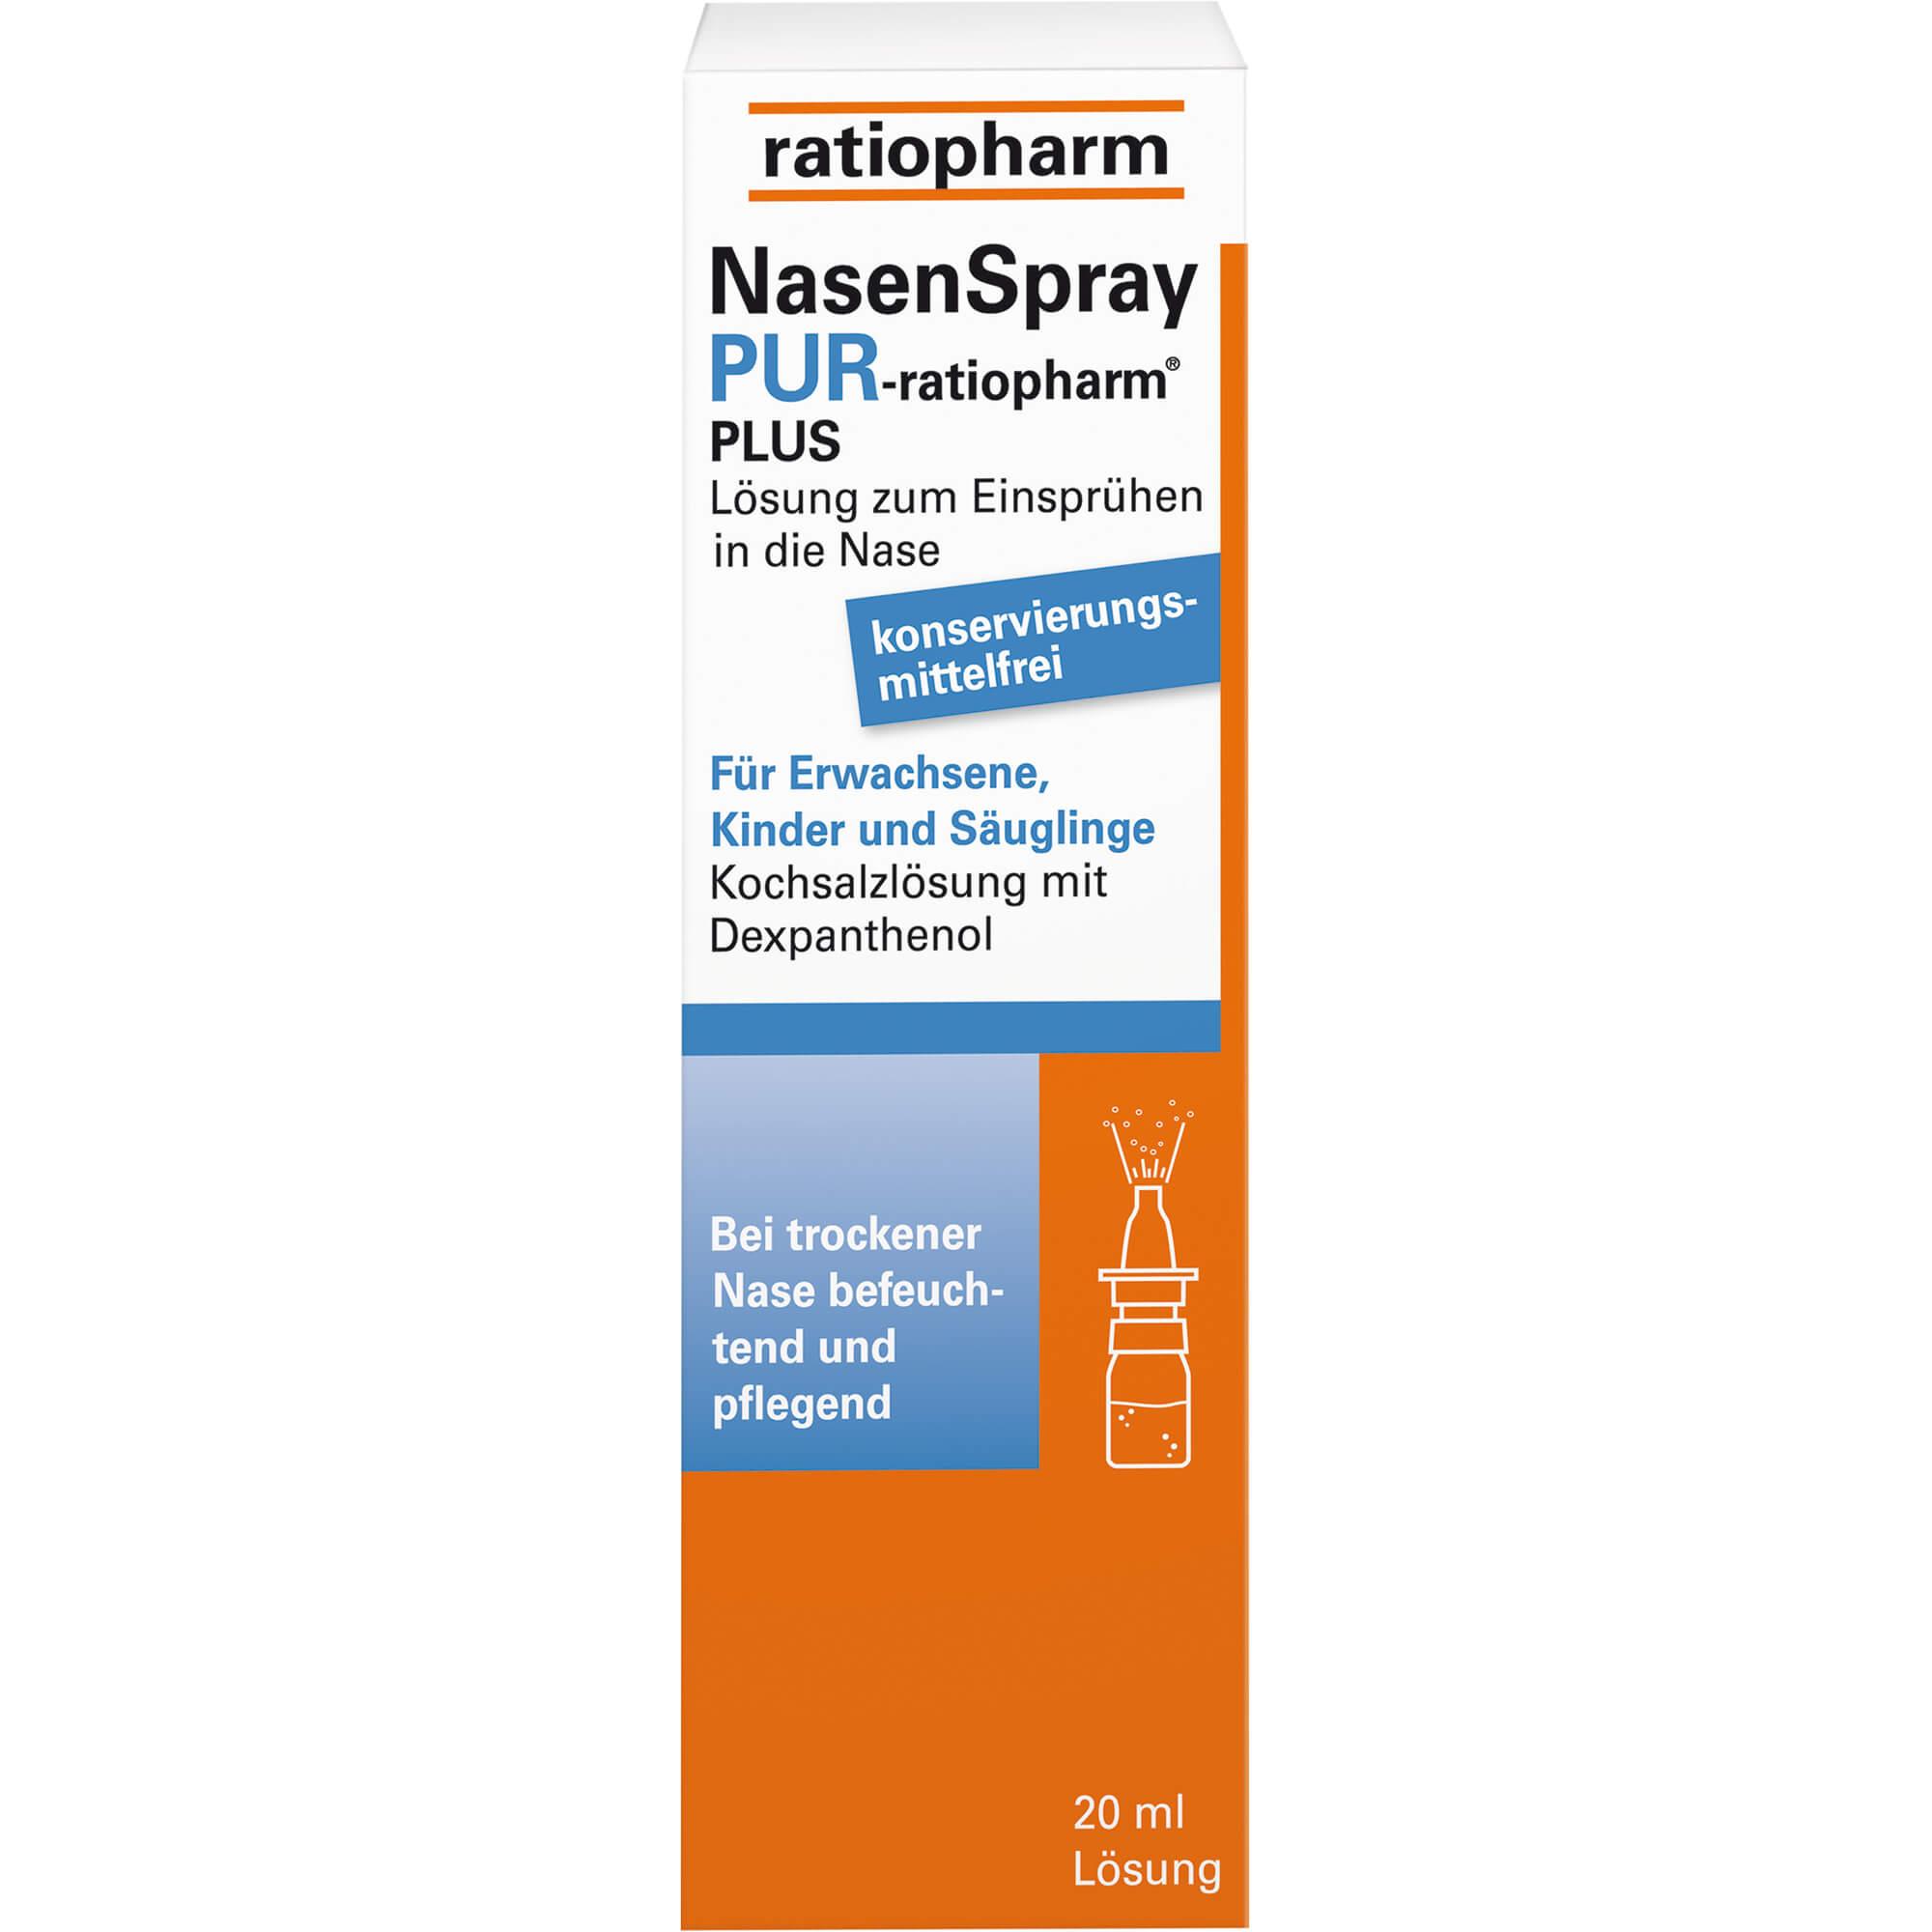 NASENSPRAY-PUR-ratiopharm-PLUS